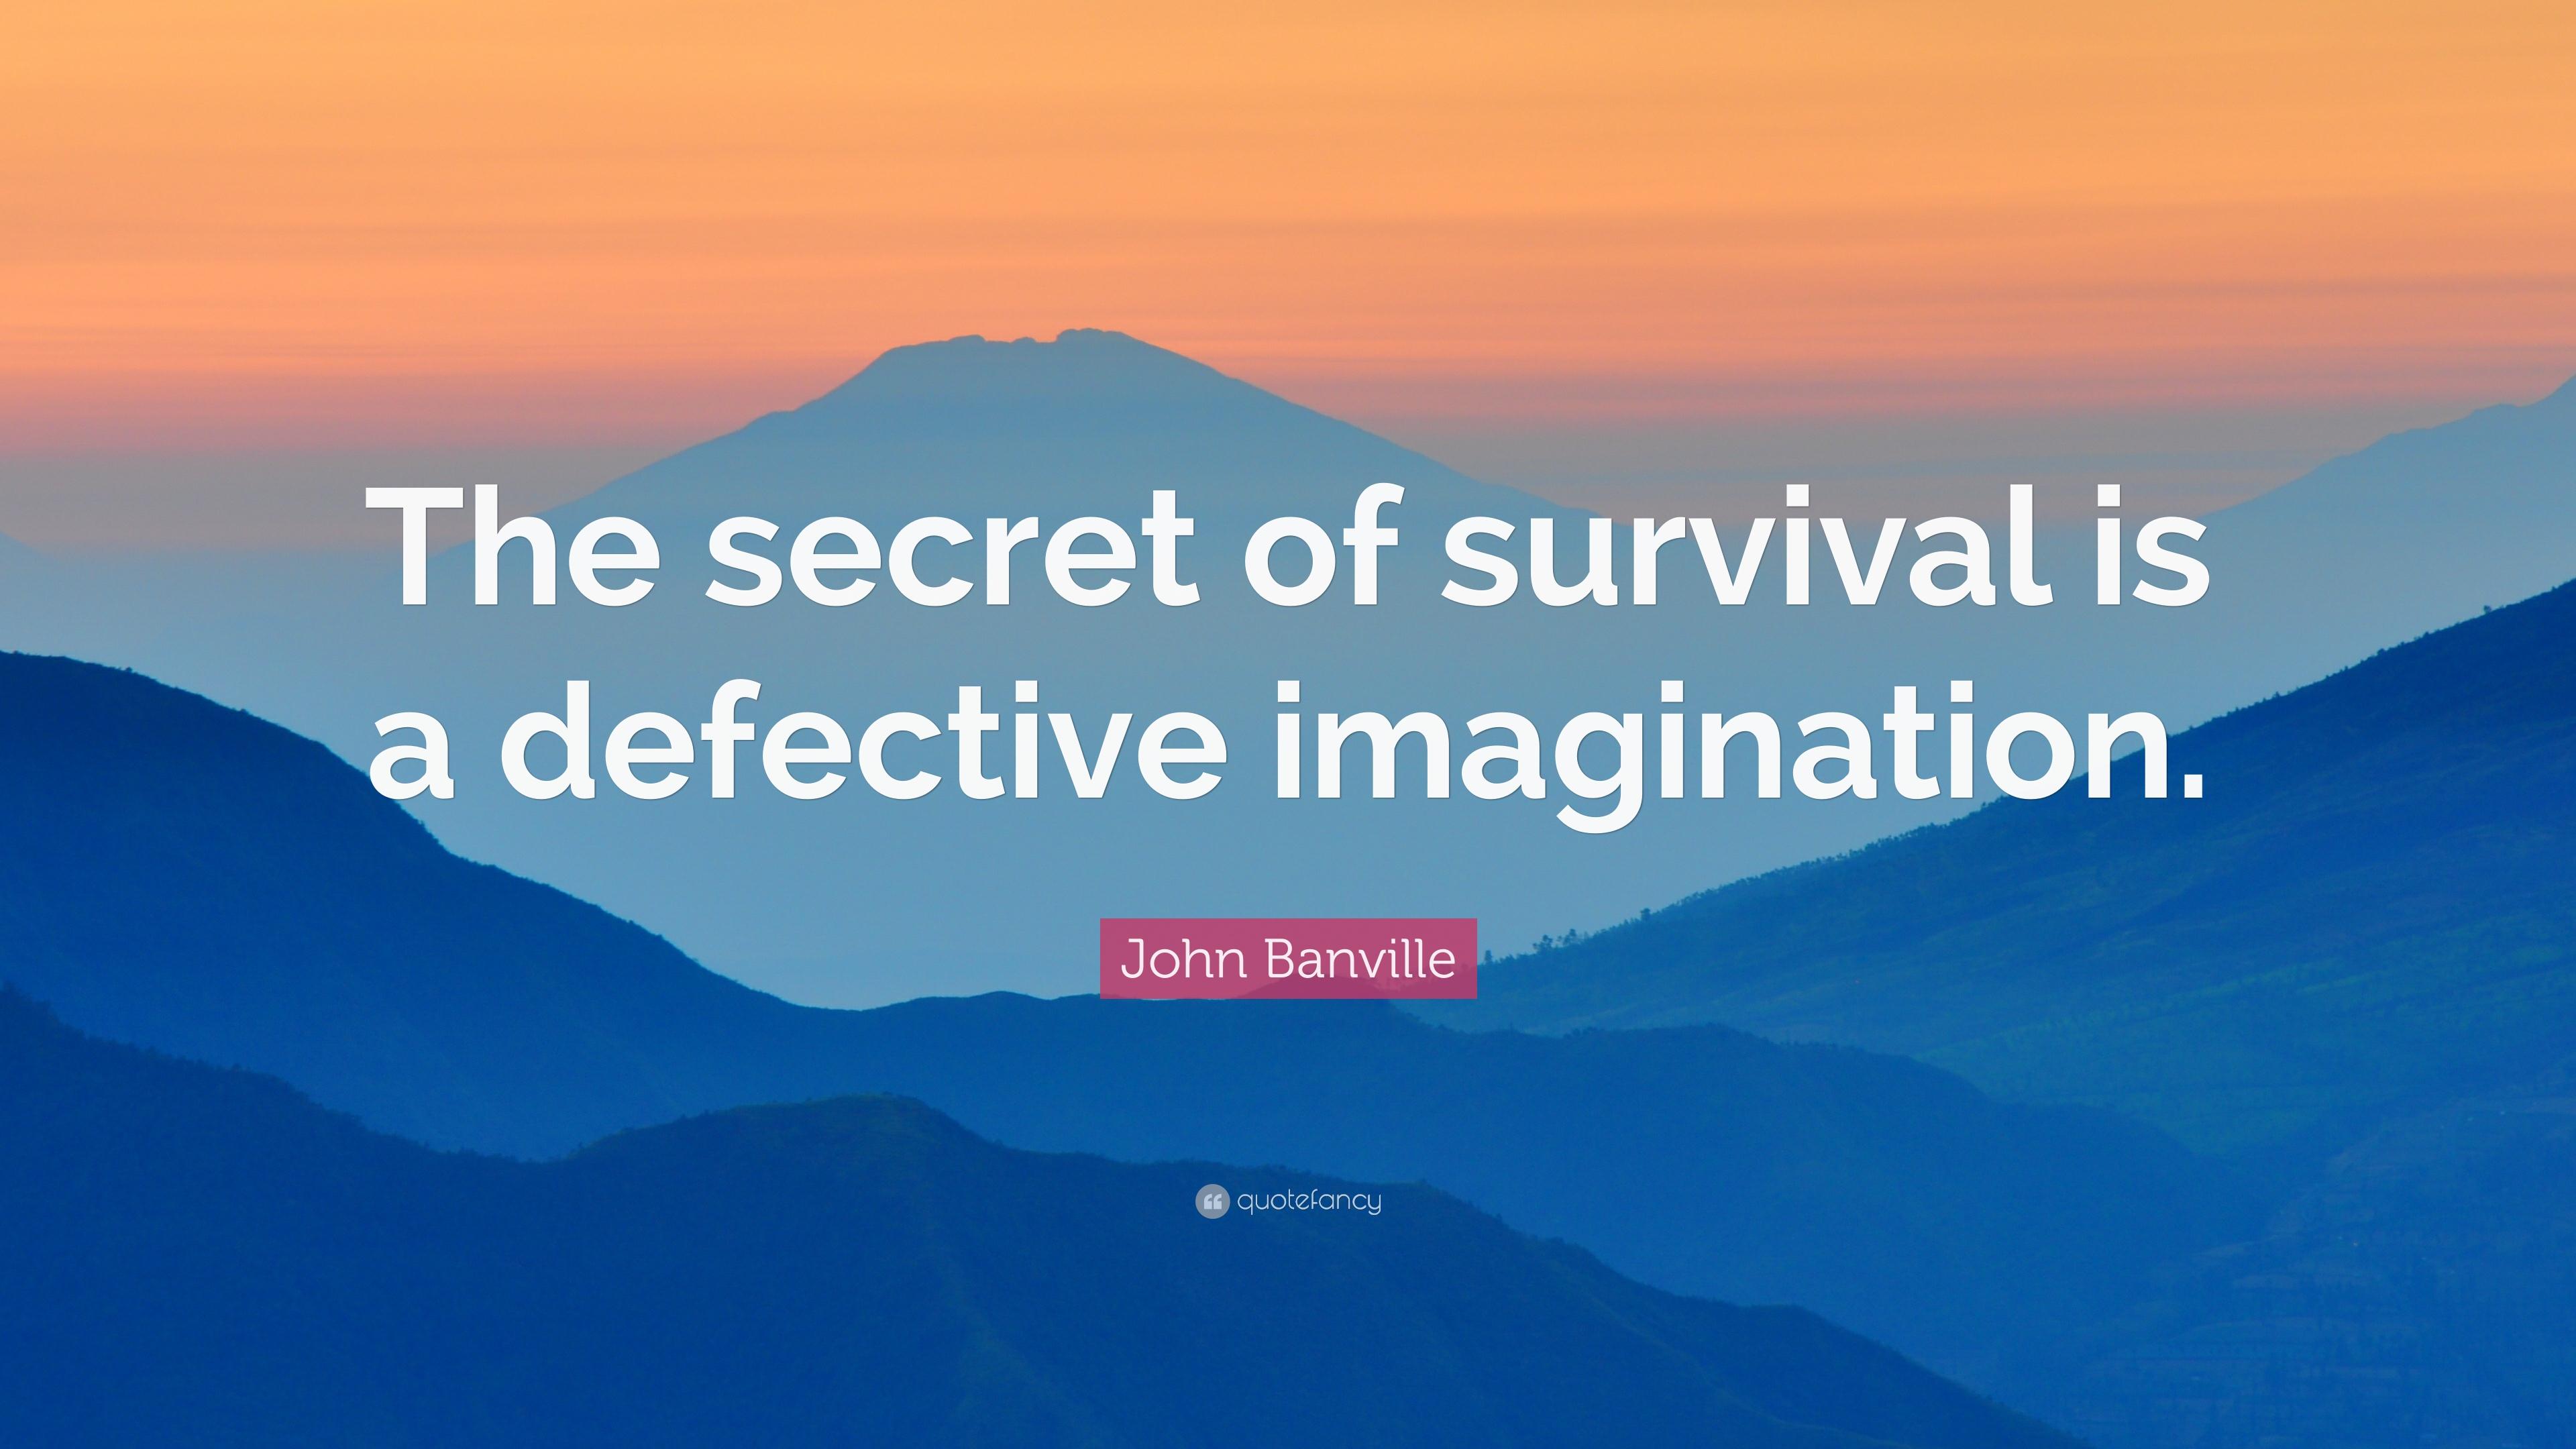 John Banville Quotes Twitter thumbnail